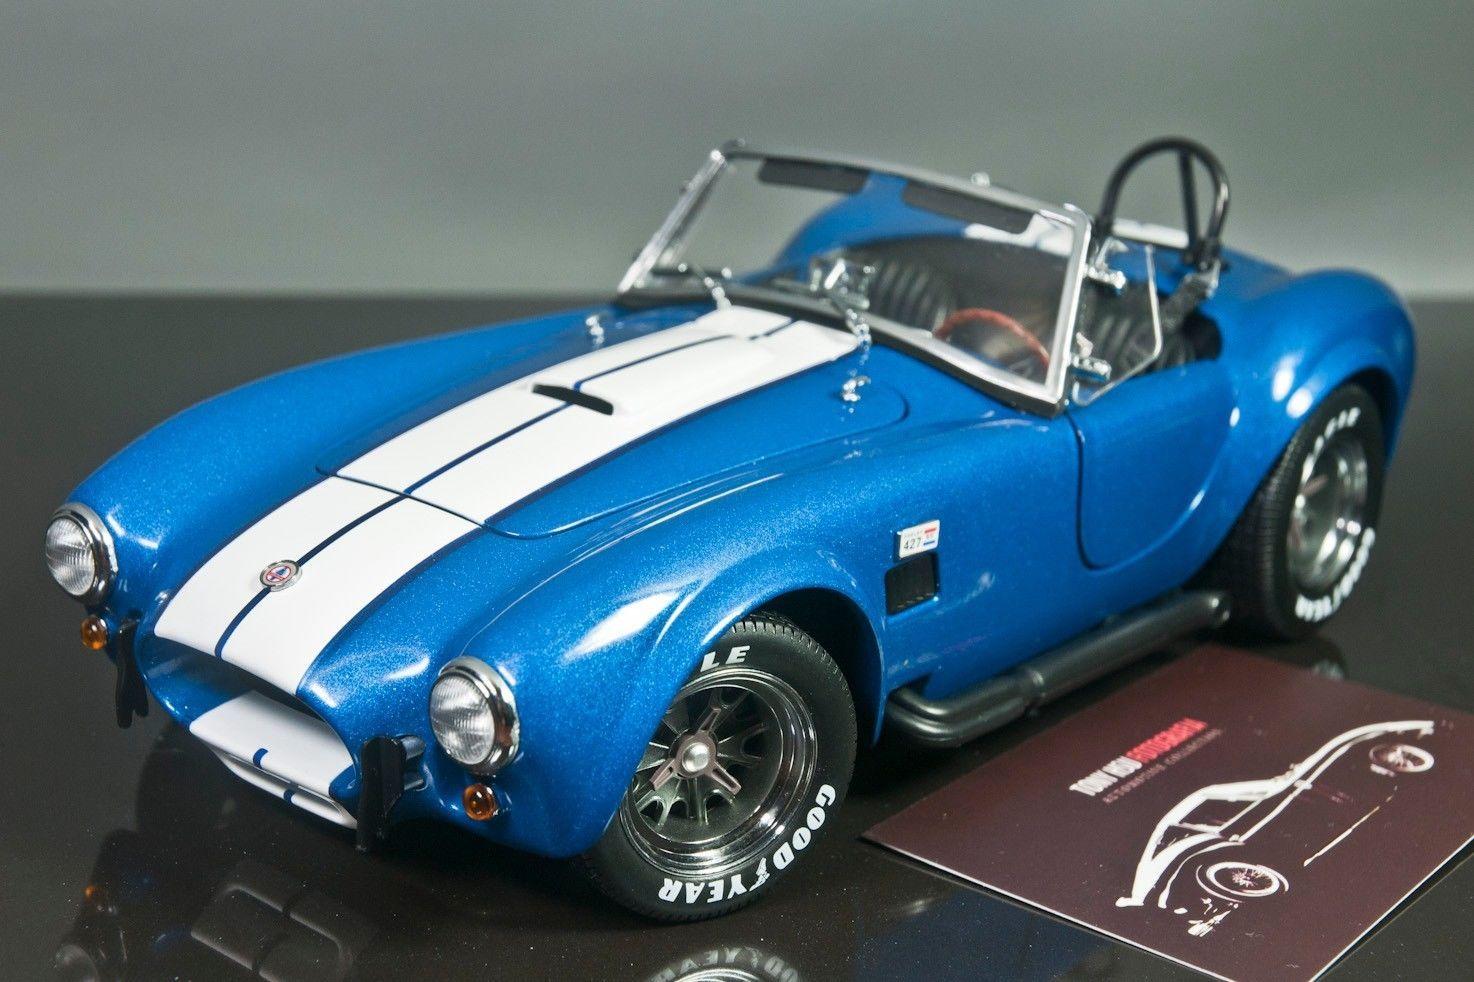 Kyosho 1 18 shelby cobra 427 s c blue with white stripes upgraded version ebay